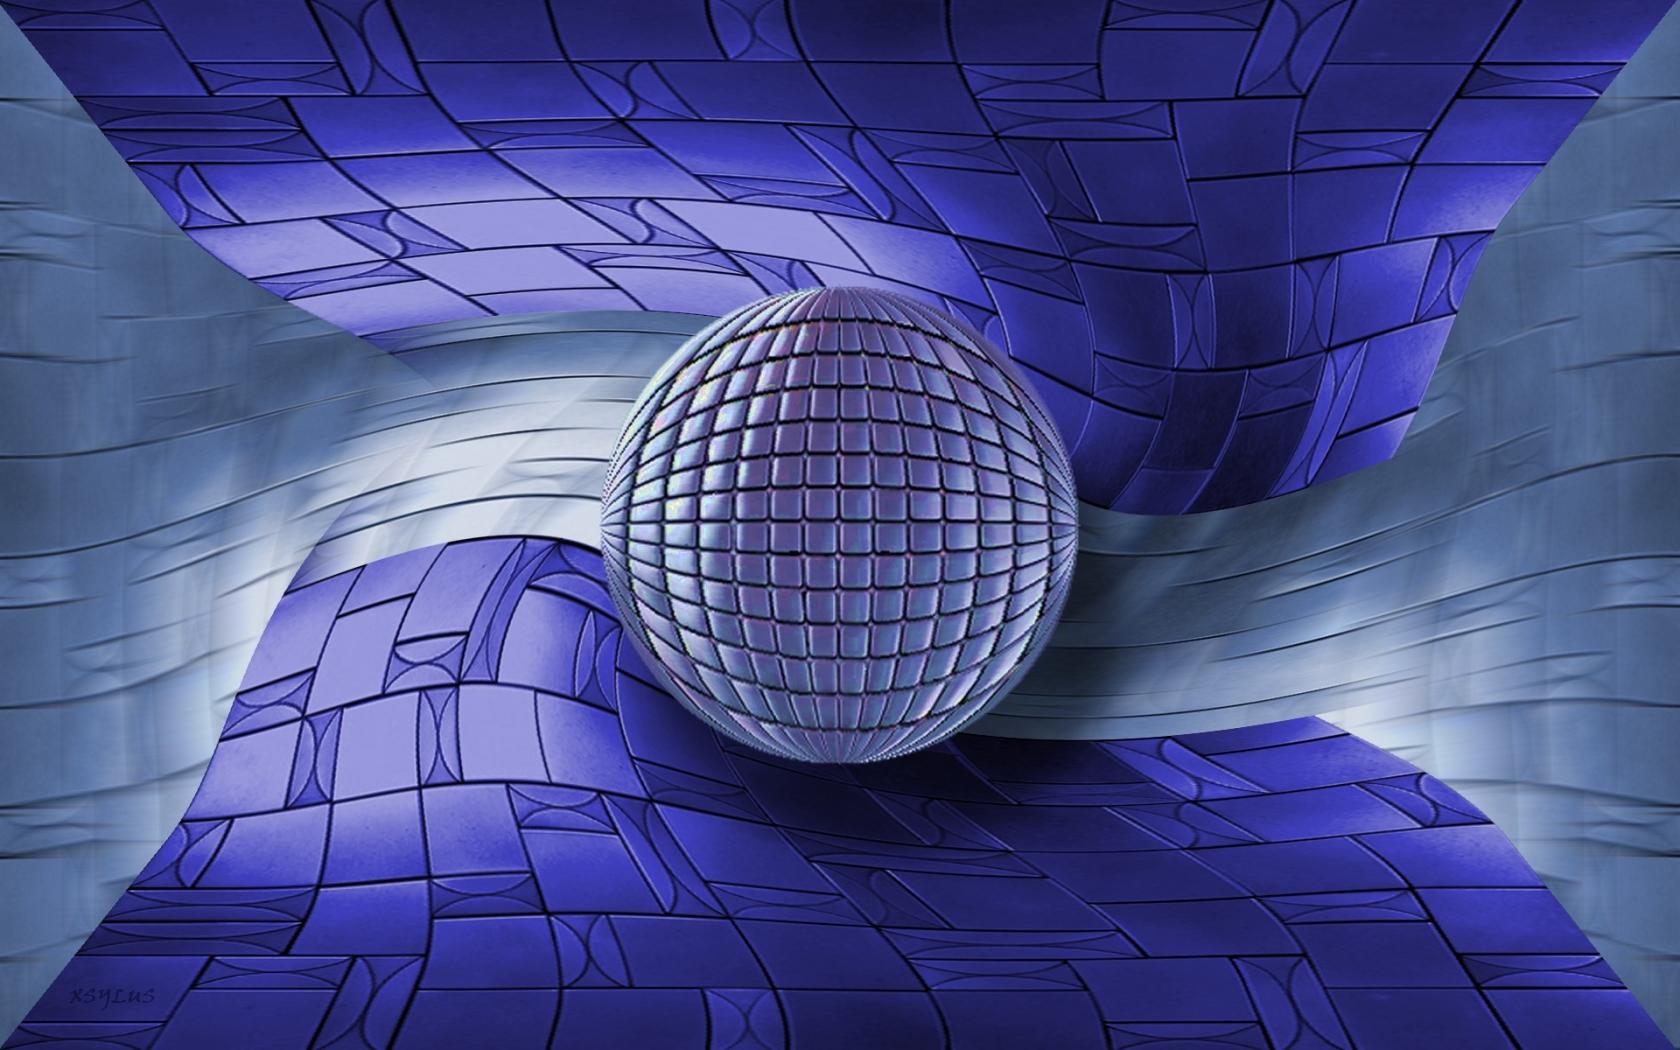 wallpaper wallpaper downloads Ultra Violet Globe 1680x1050